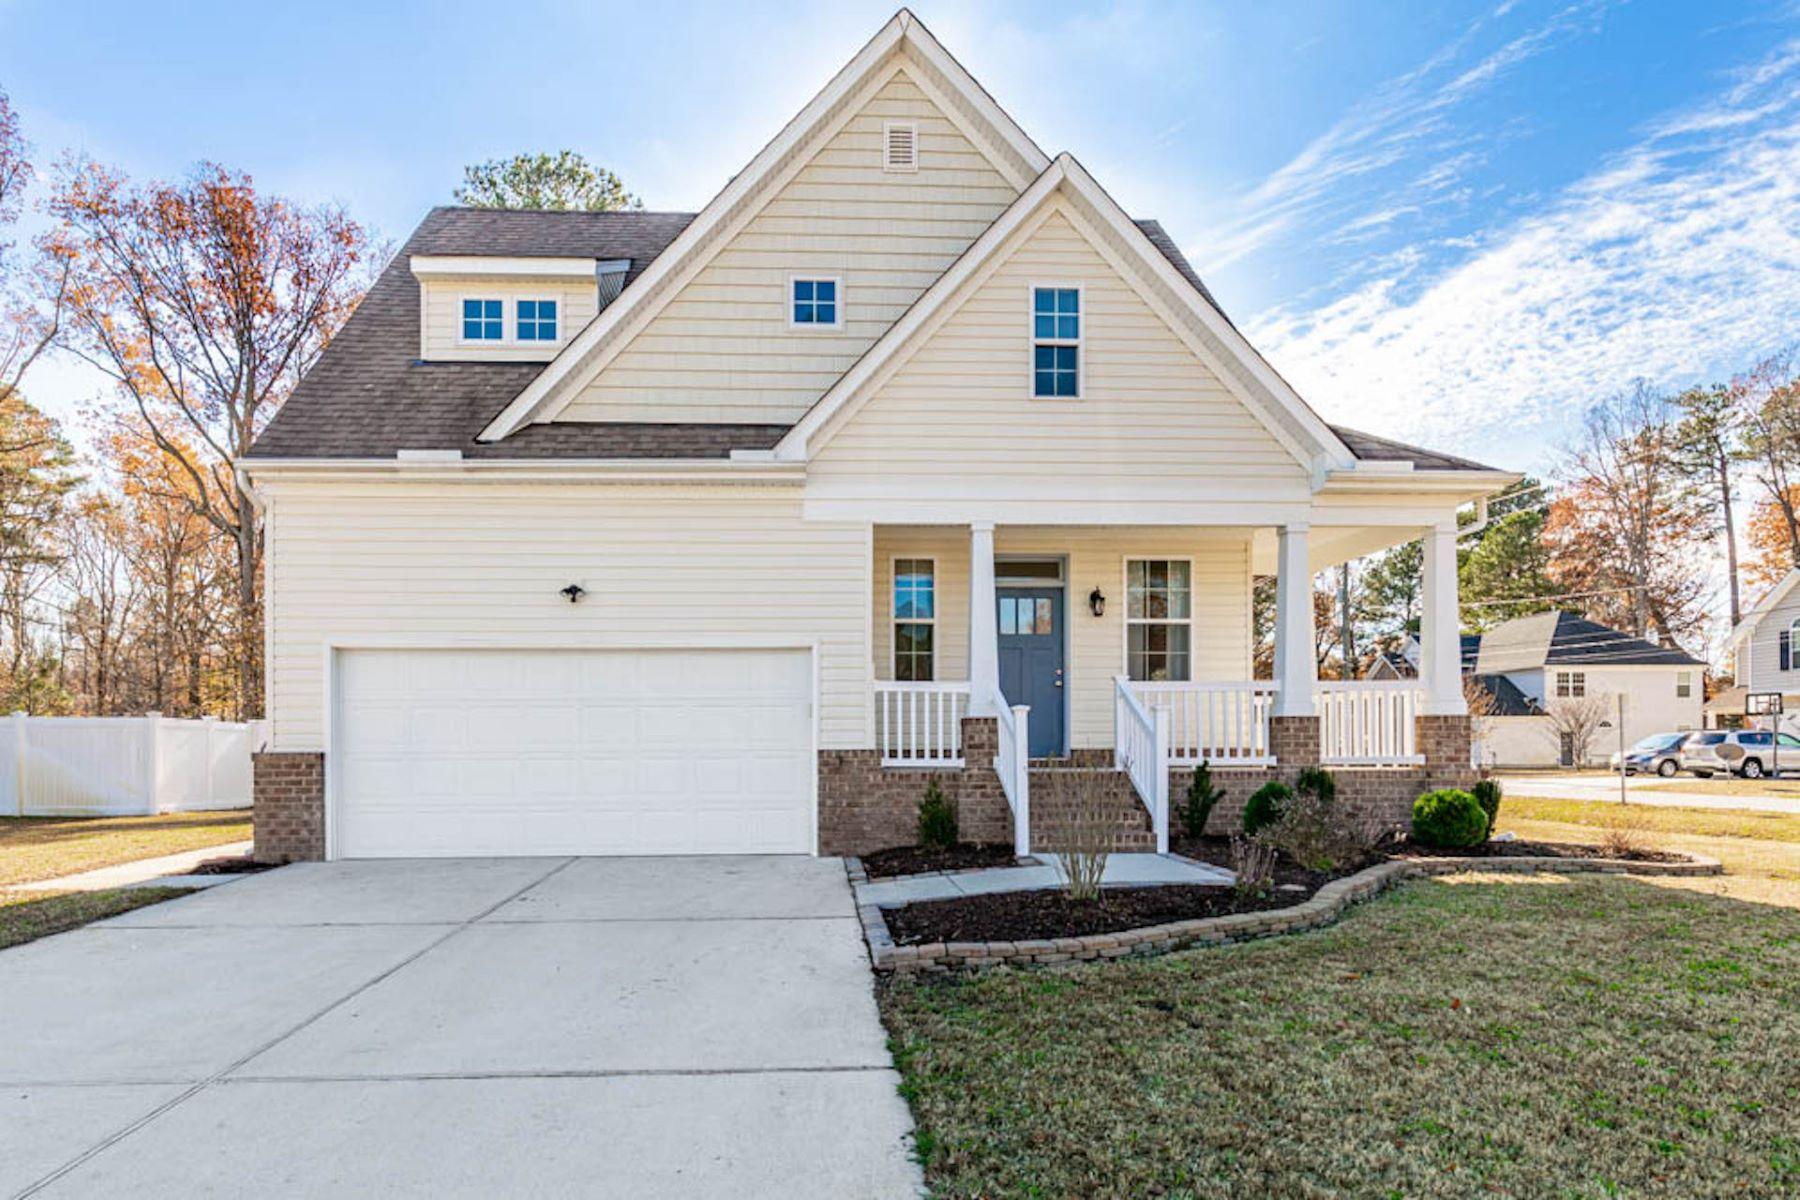 Single Family Homes for Active at ARLINGTON MEADOWS 1301 Waycroft Reach Chesapeake, Virginia 23320 United States